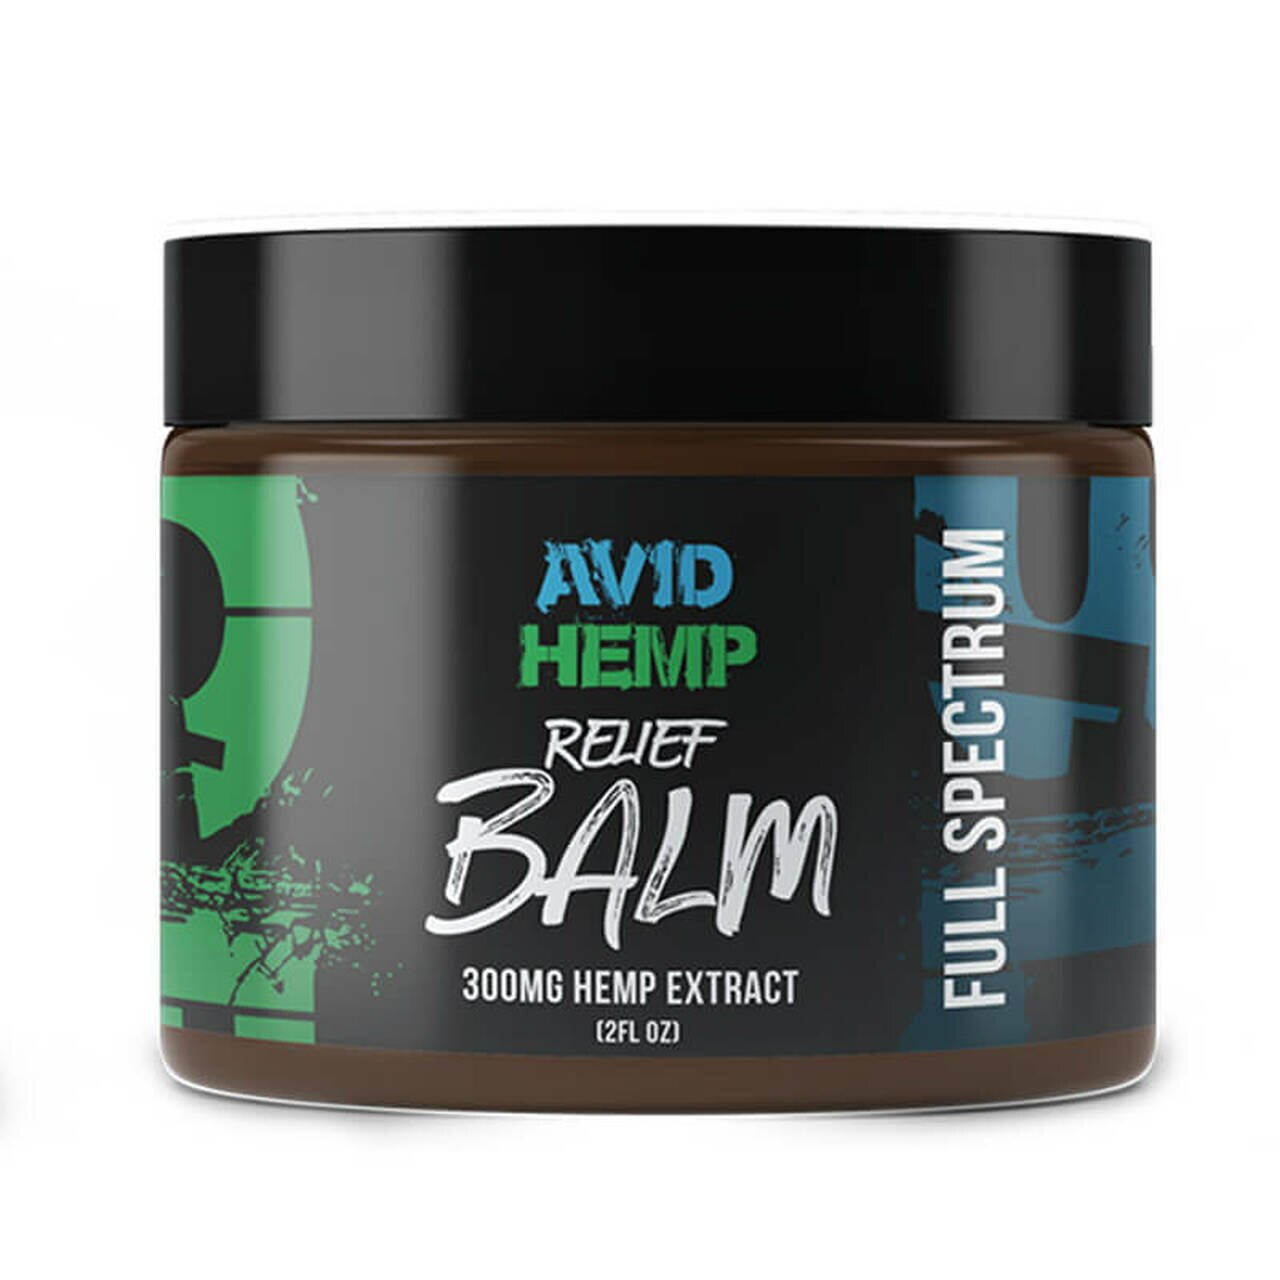 AVID HEMP CBD Topical Relief Balm